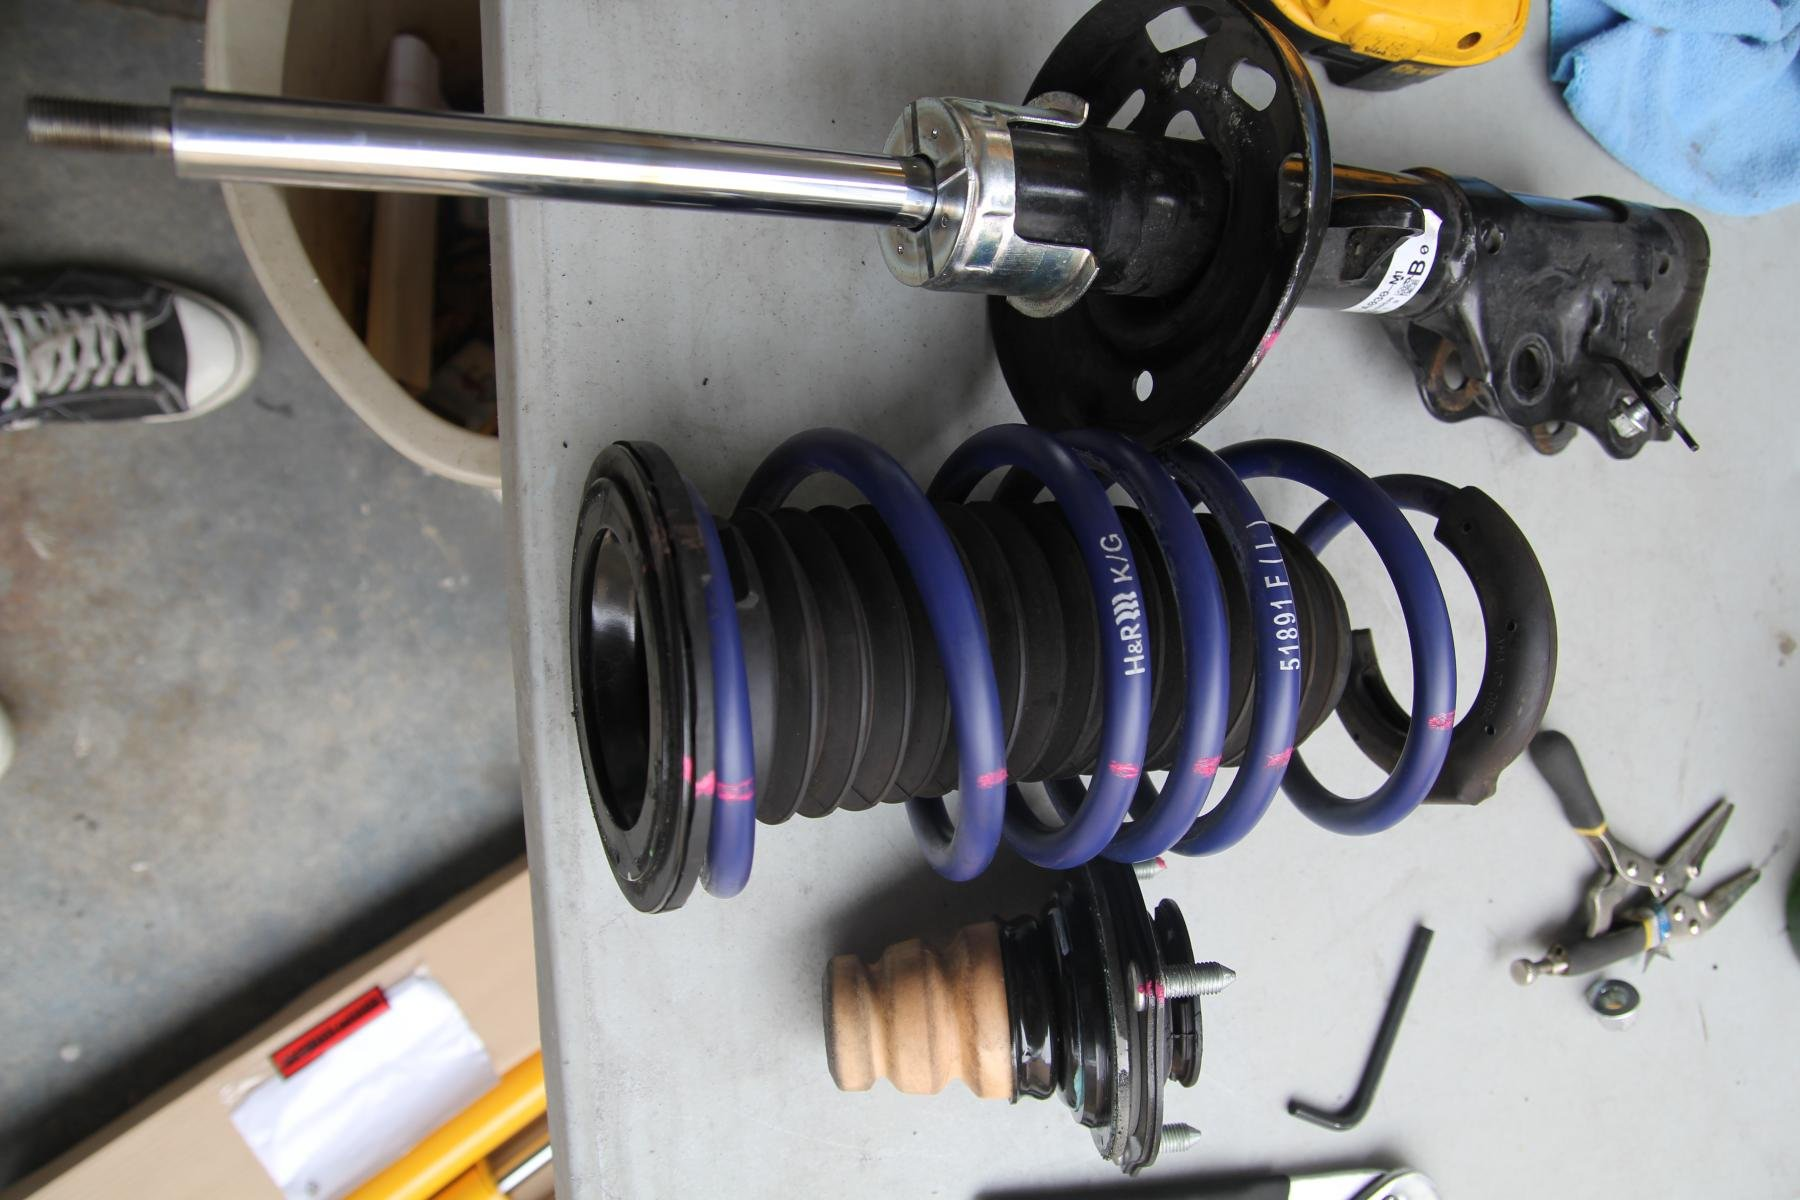 Koni Front Shock Intsall DIY. PIC HEAVY THREAD!-img_2980.jpg